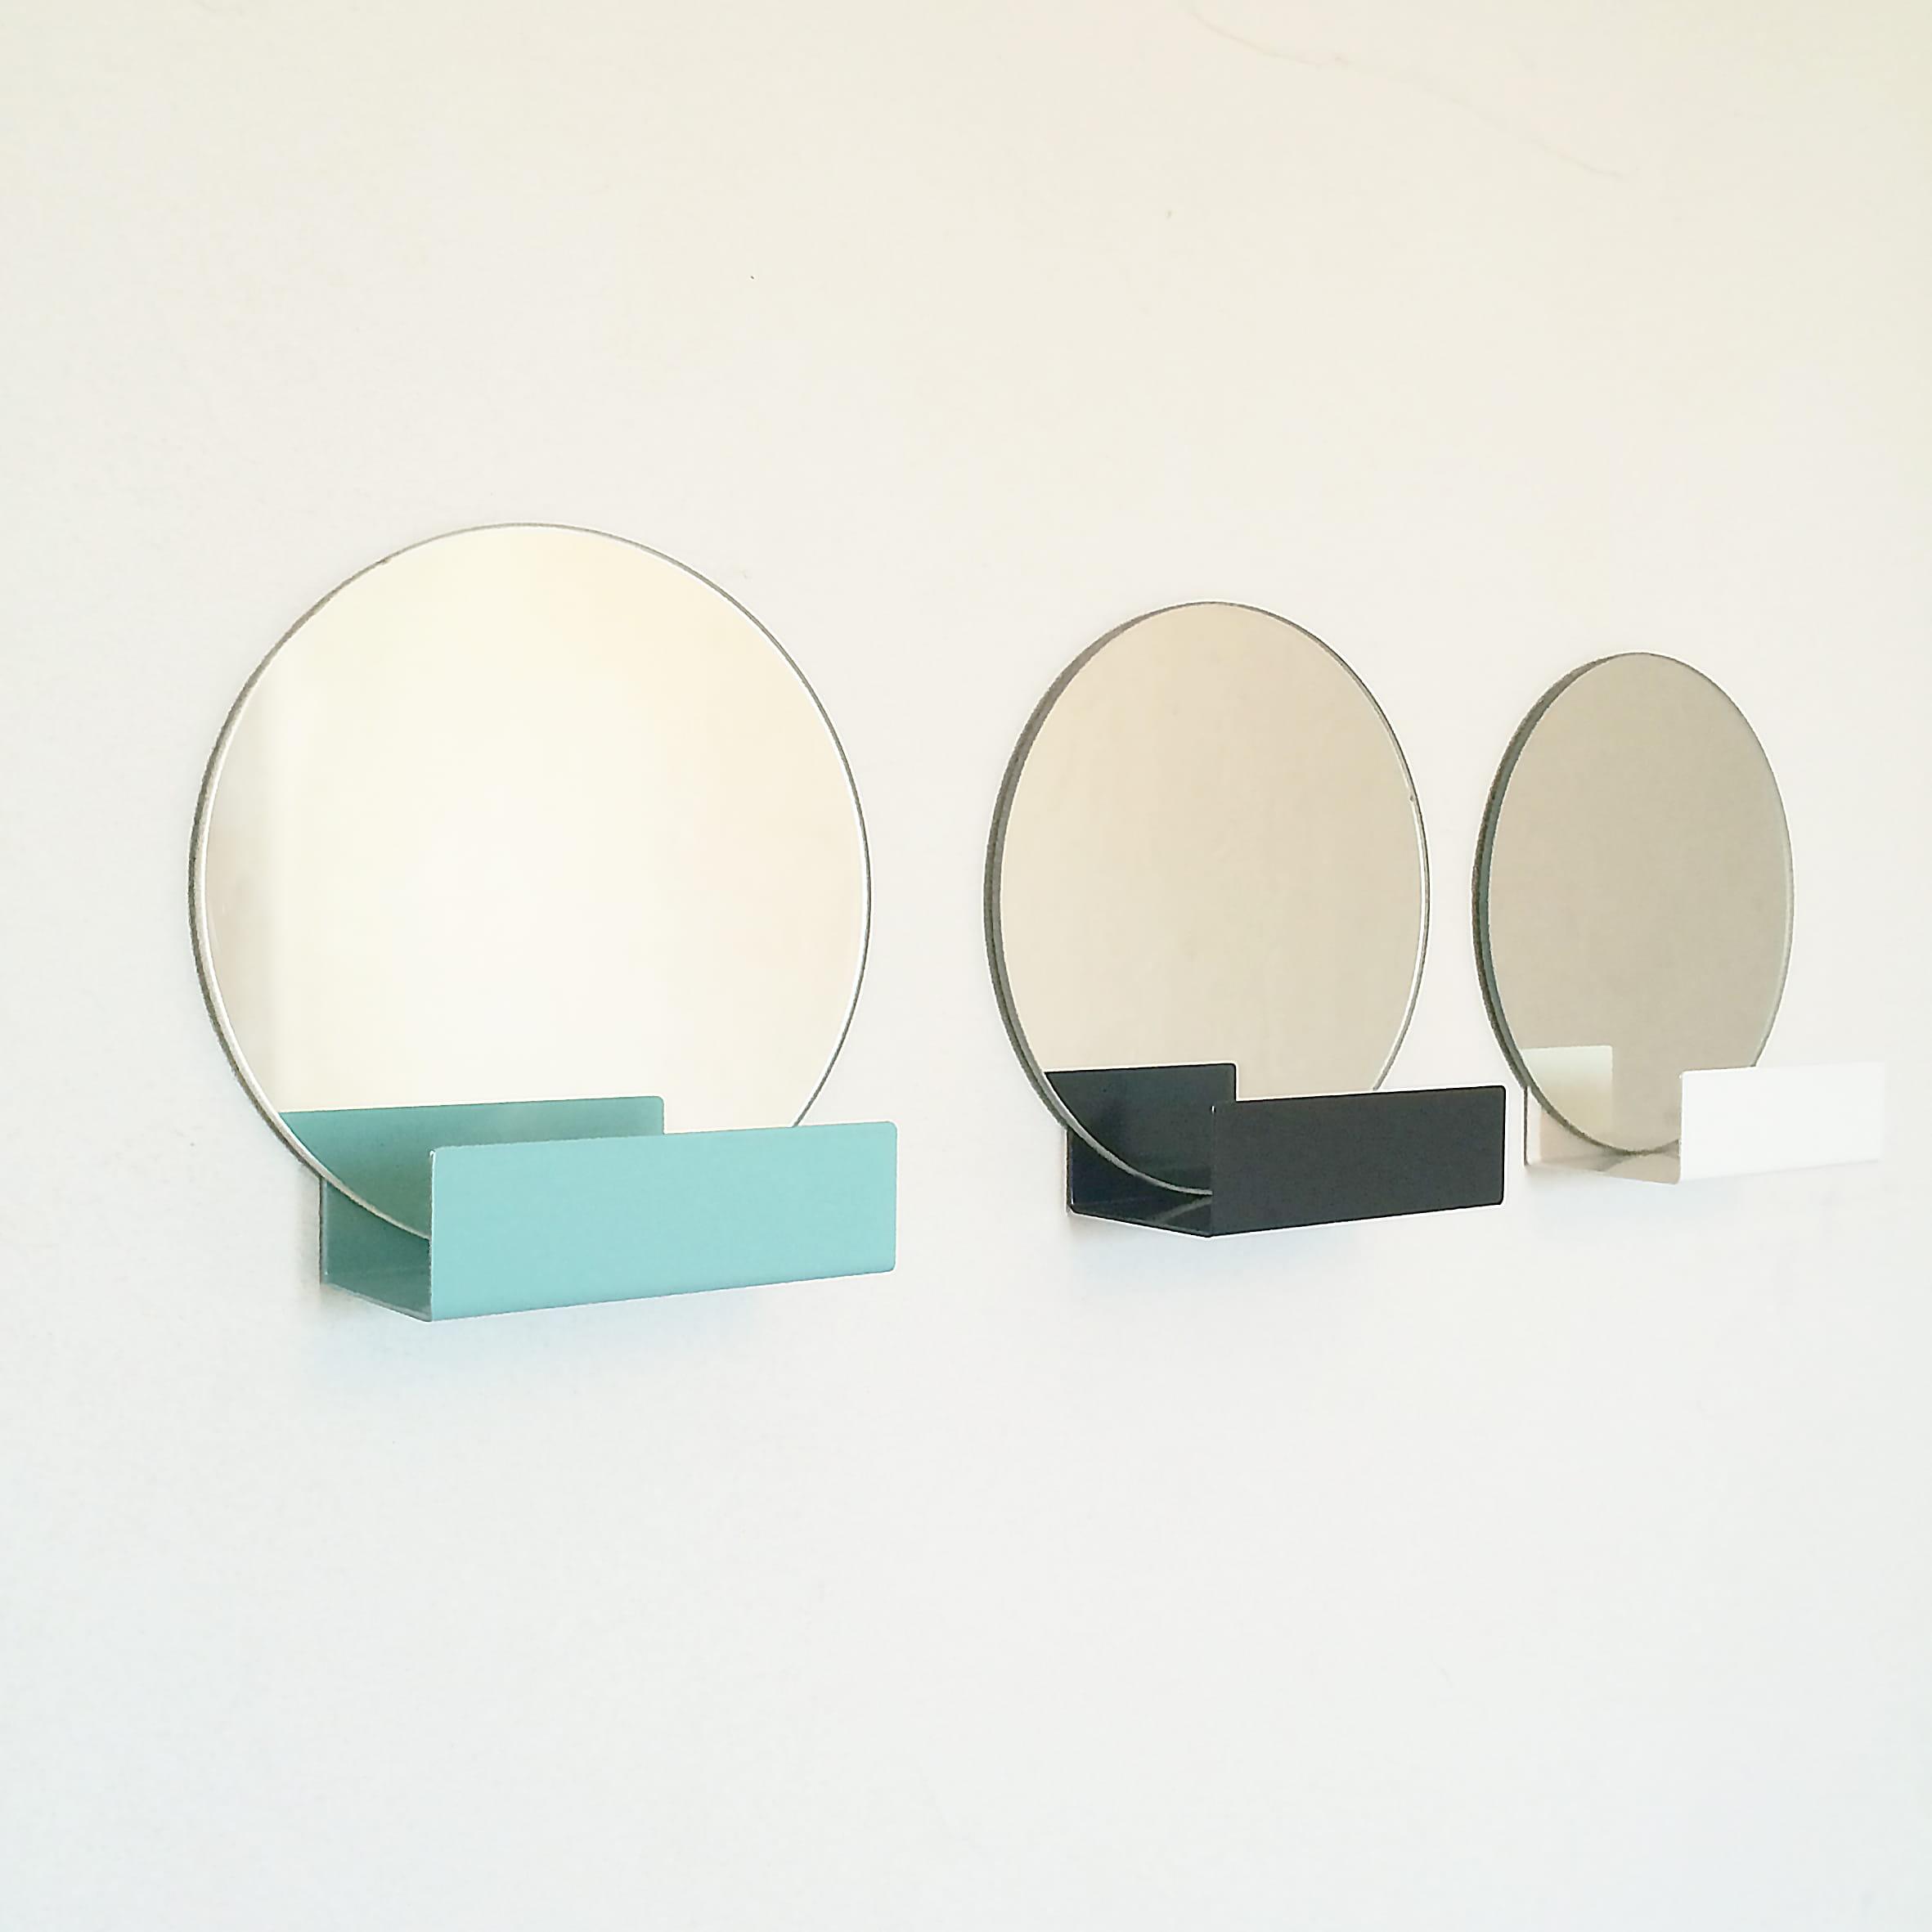 Miroir mon beau miroir d 39 an so for Mon beau miroir